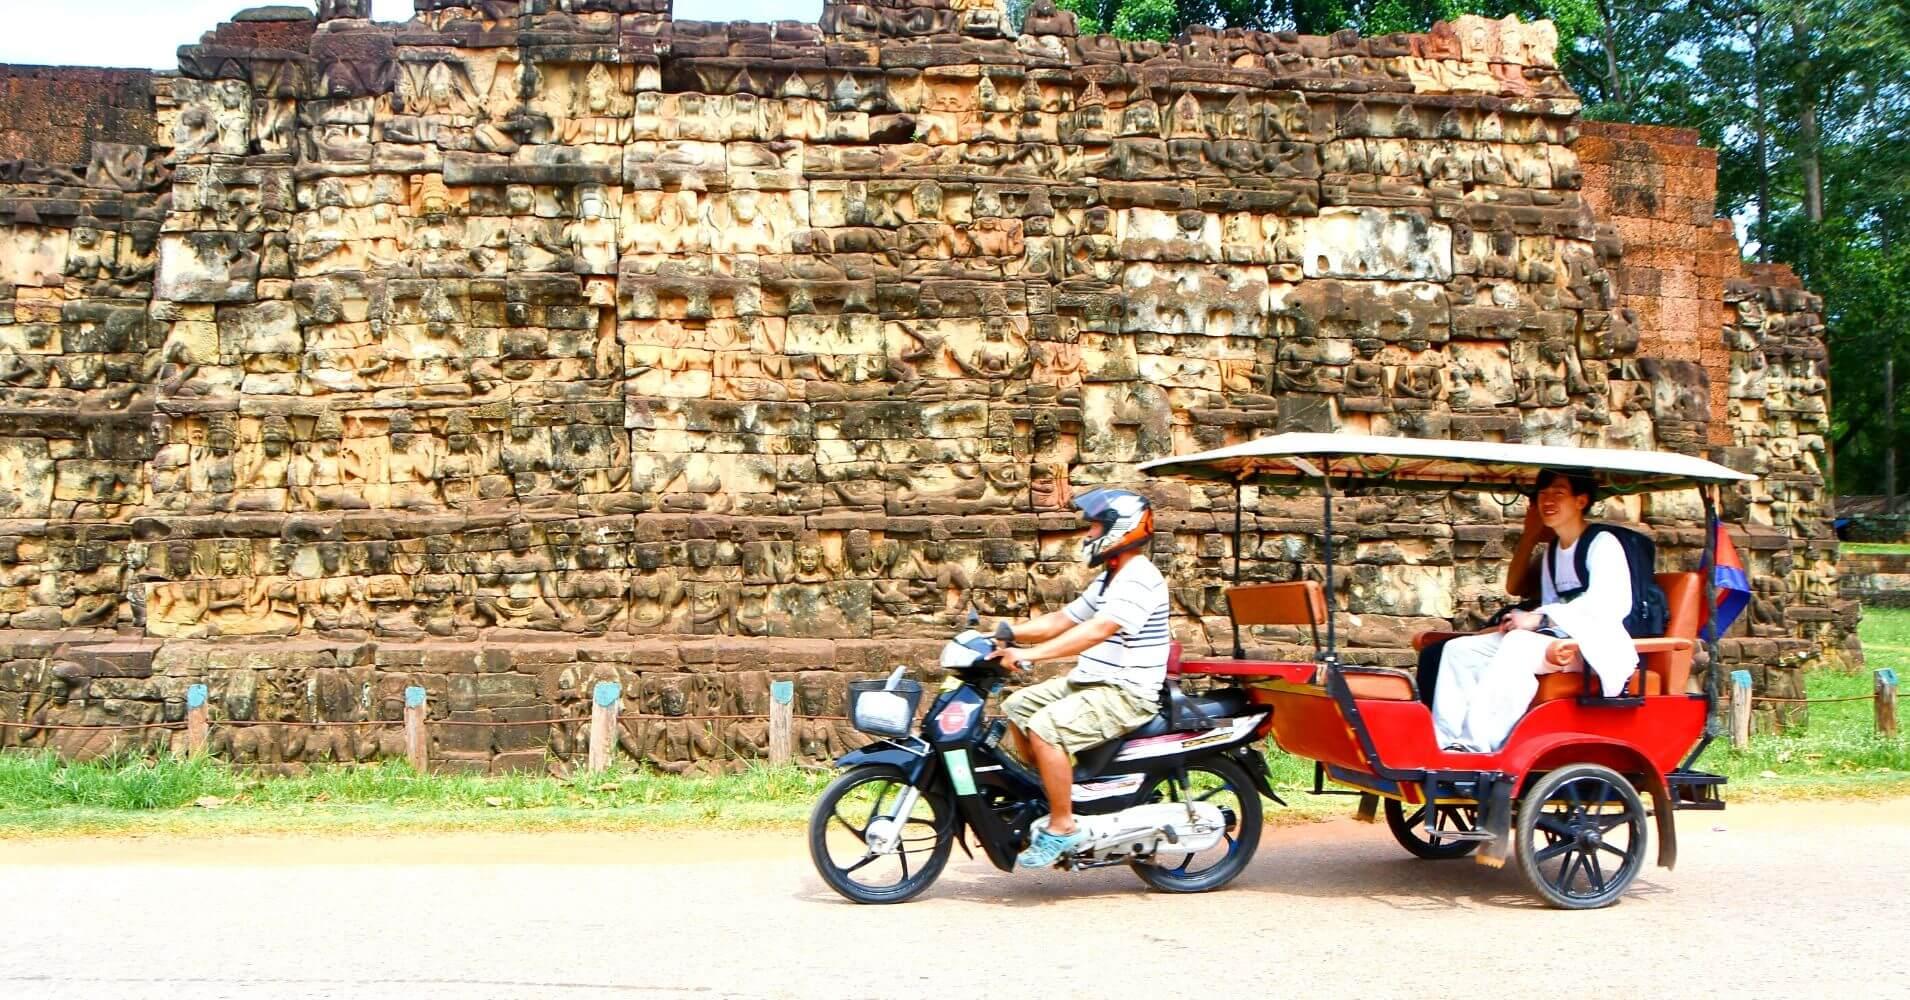 Viajar a Camboya. Tuk Tuk en los Templos de Angkor. Siem Reap.